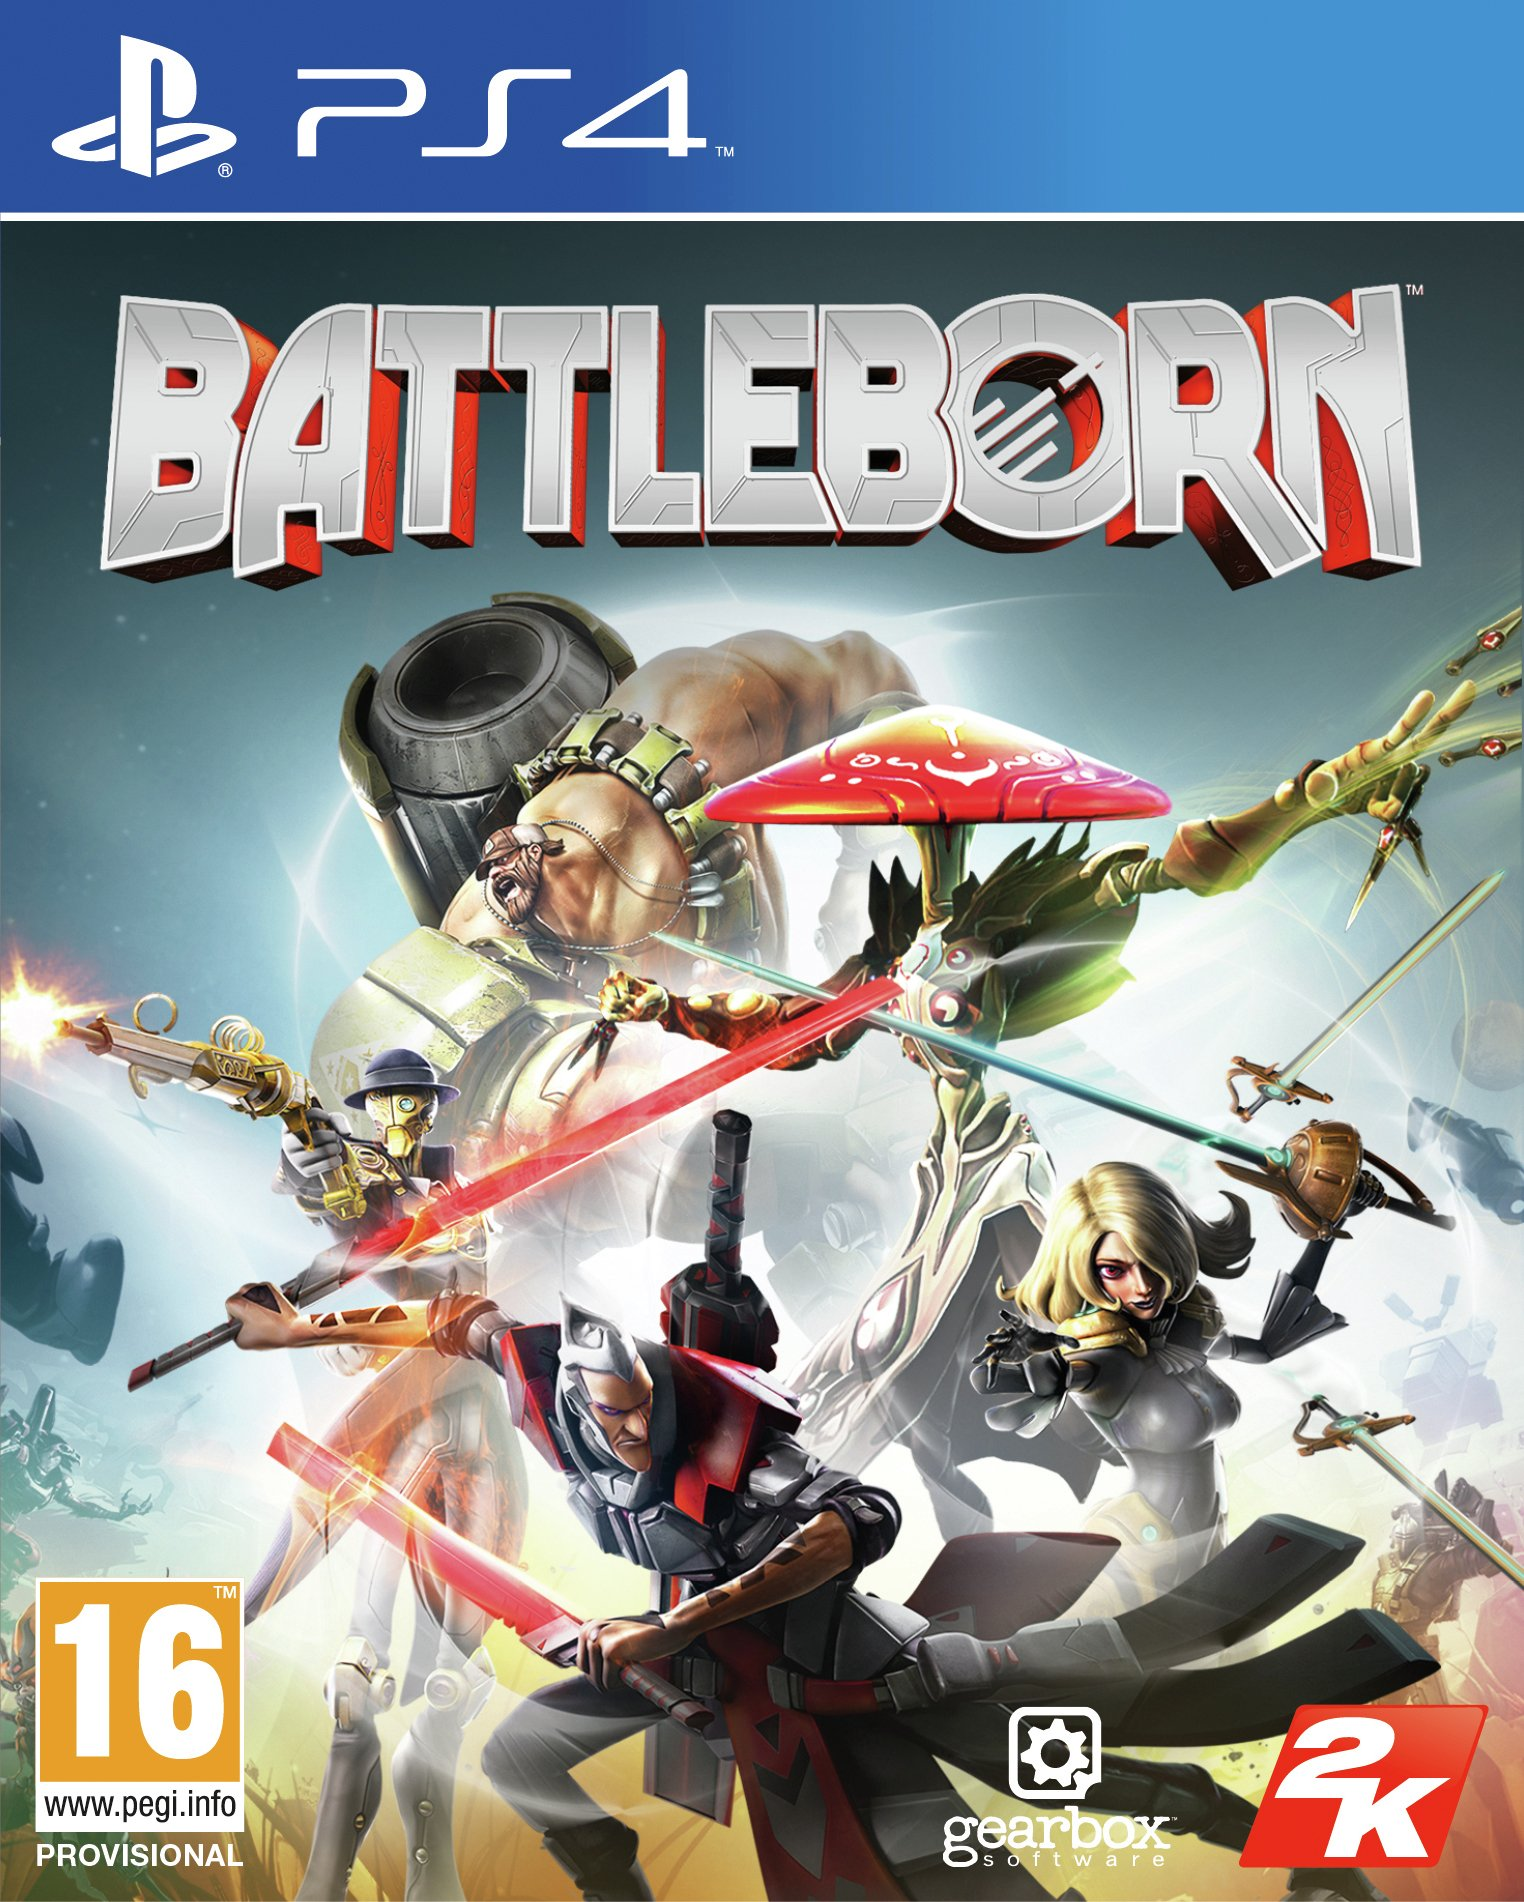 Image of Battleborn - PS4 Game.